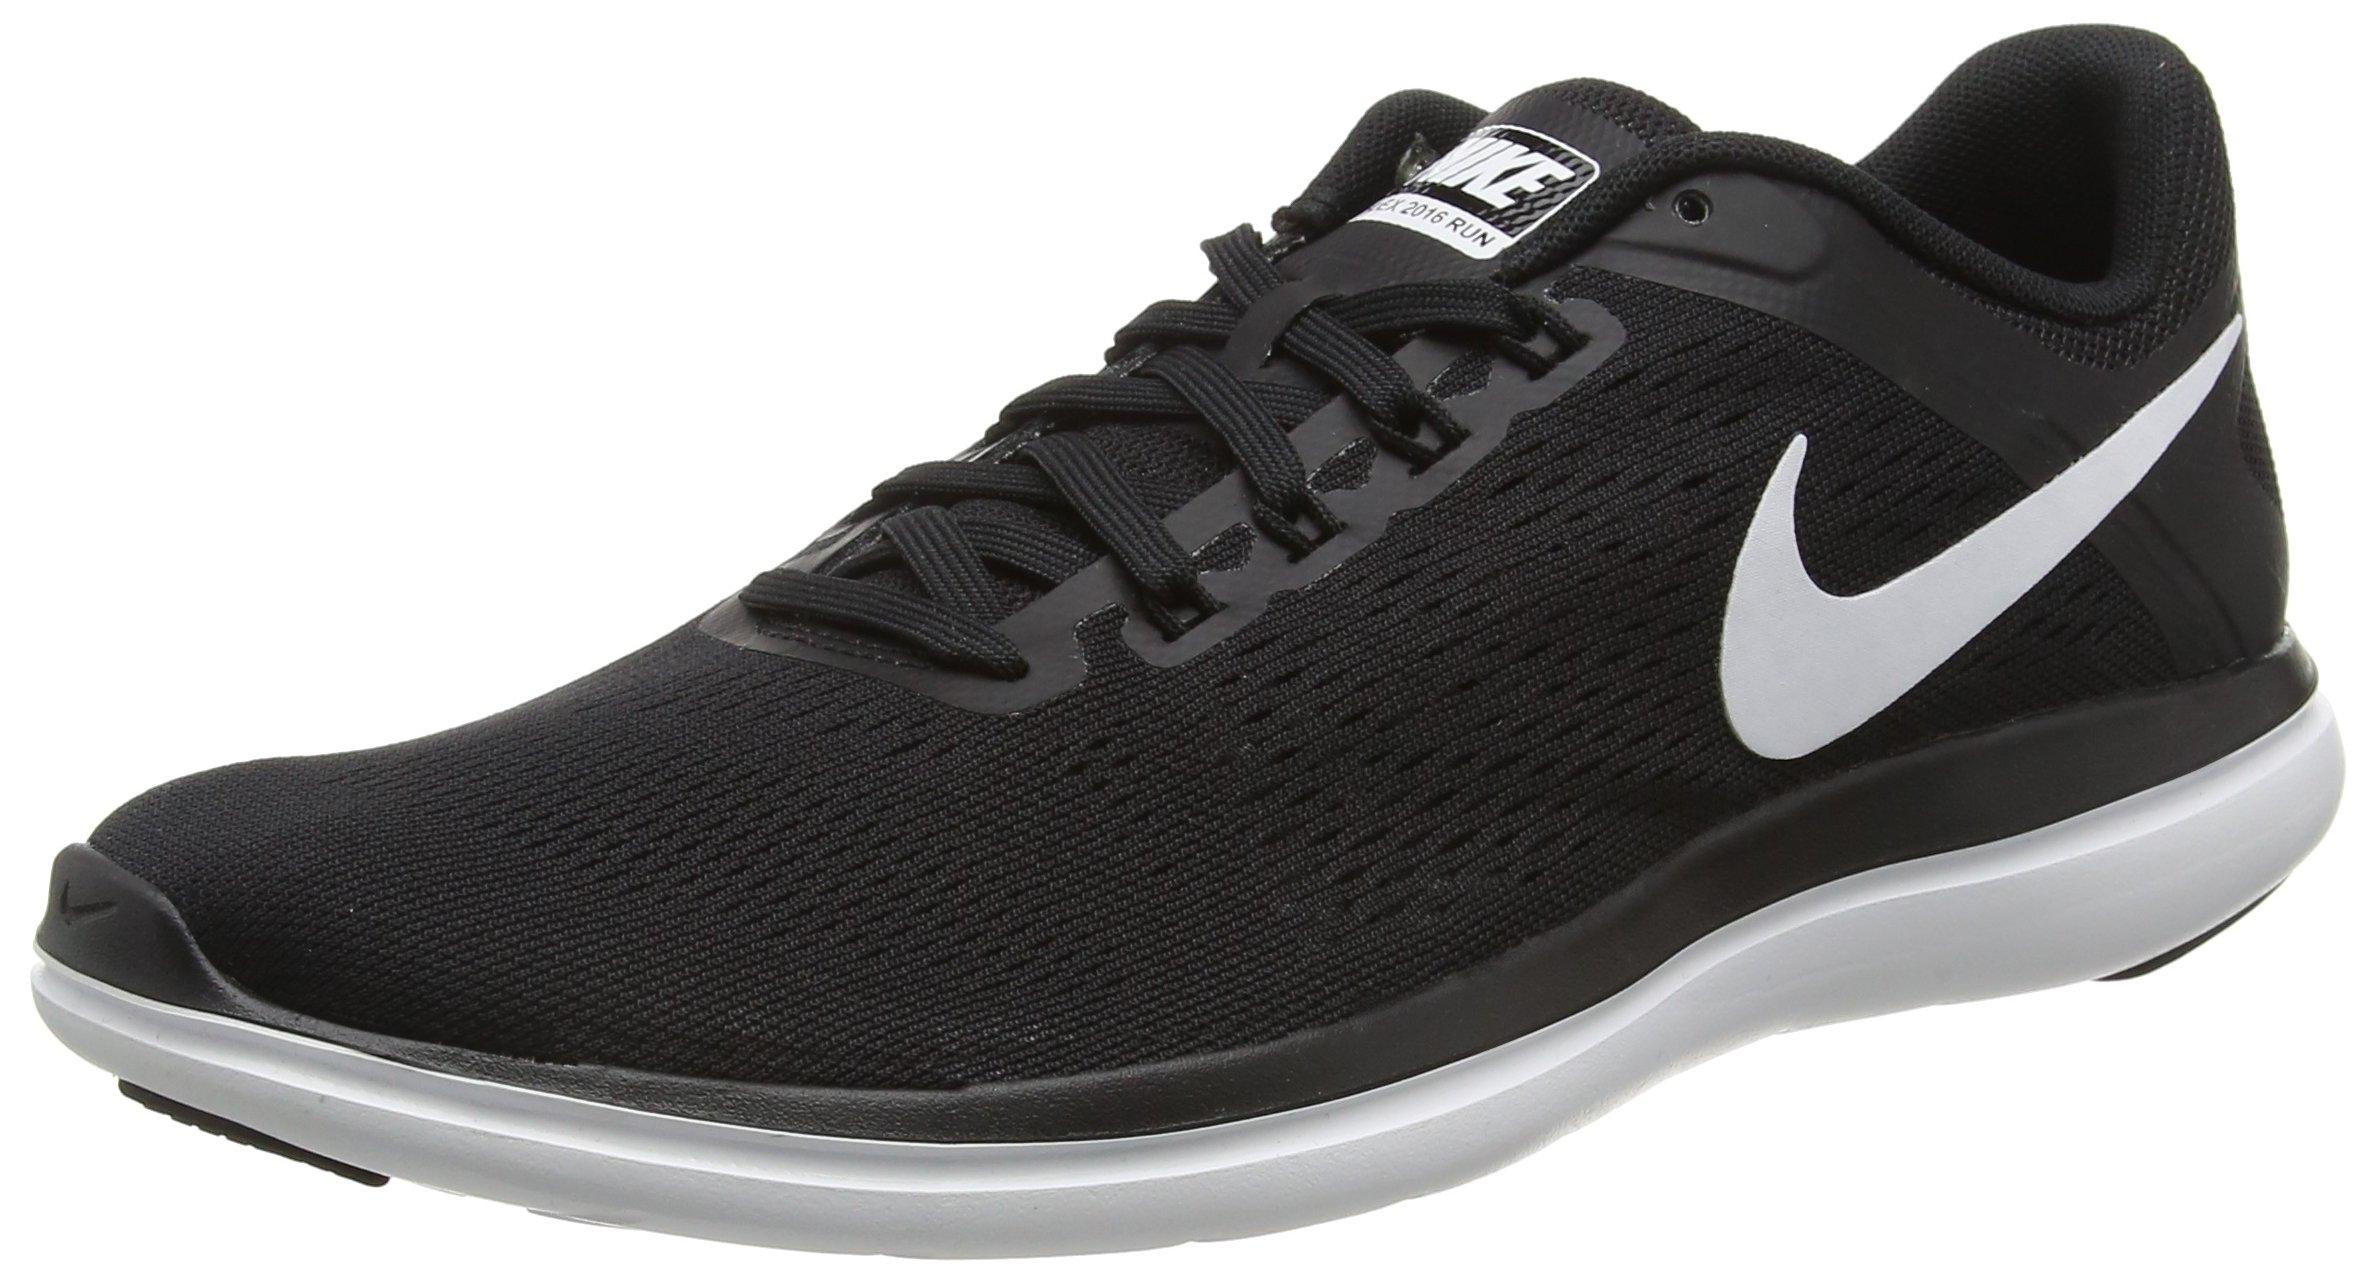 Nike Mens Downshifter  Replacement Shoe